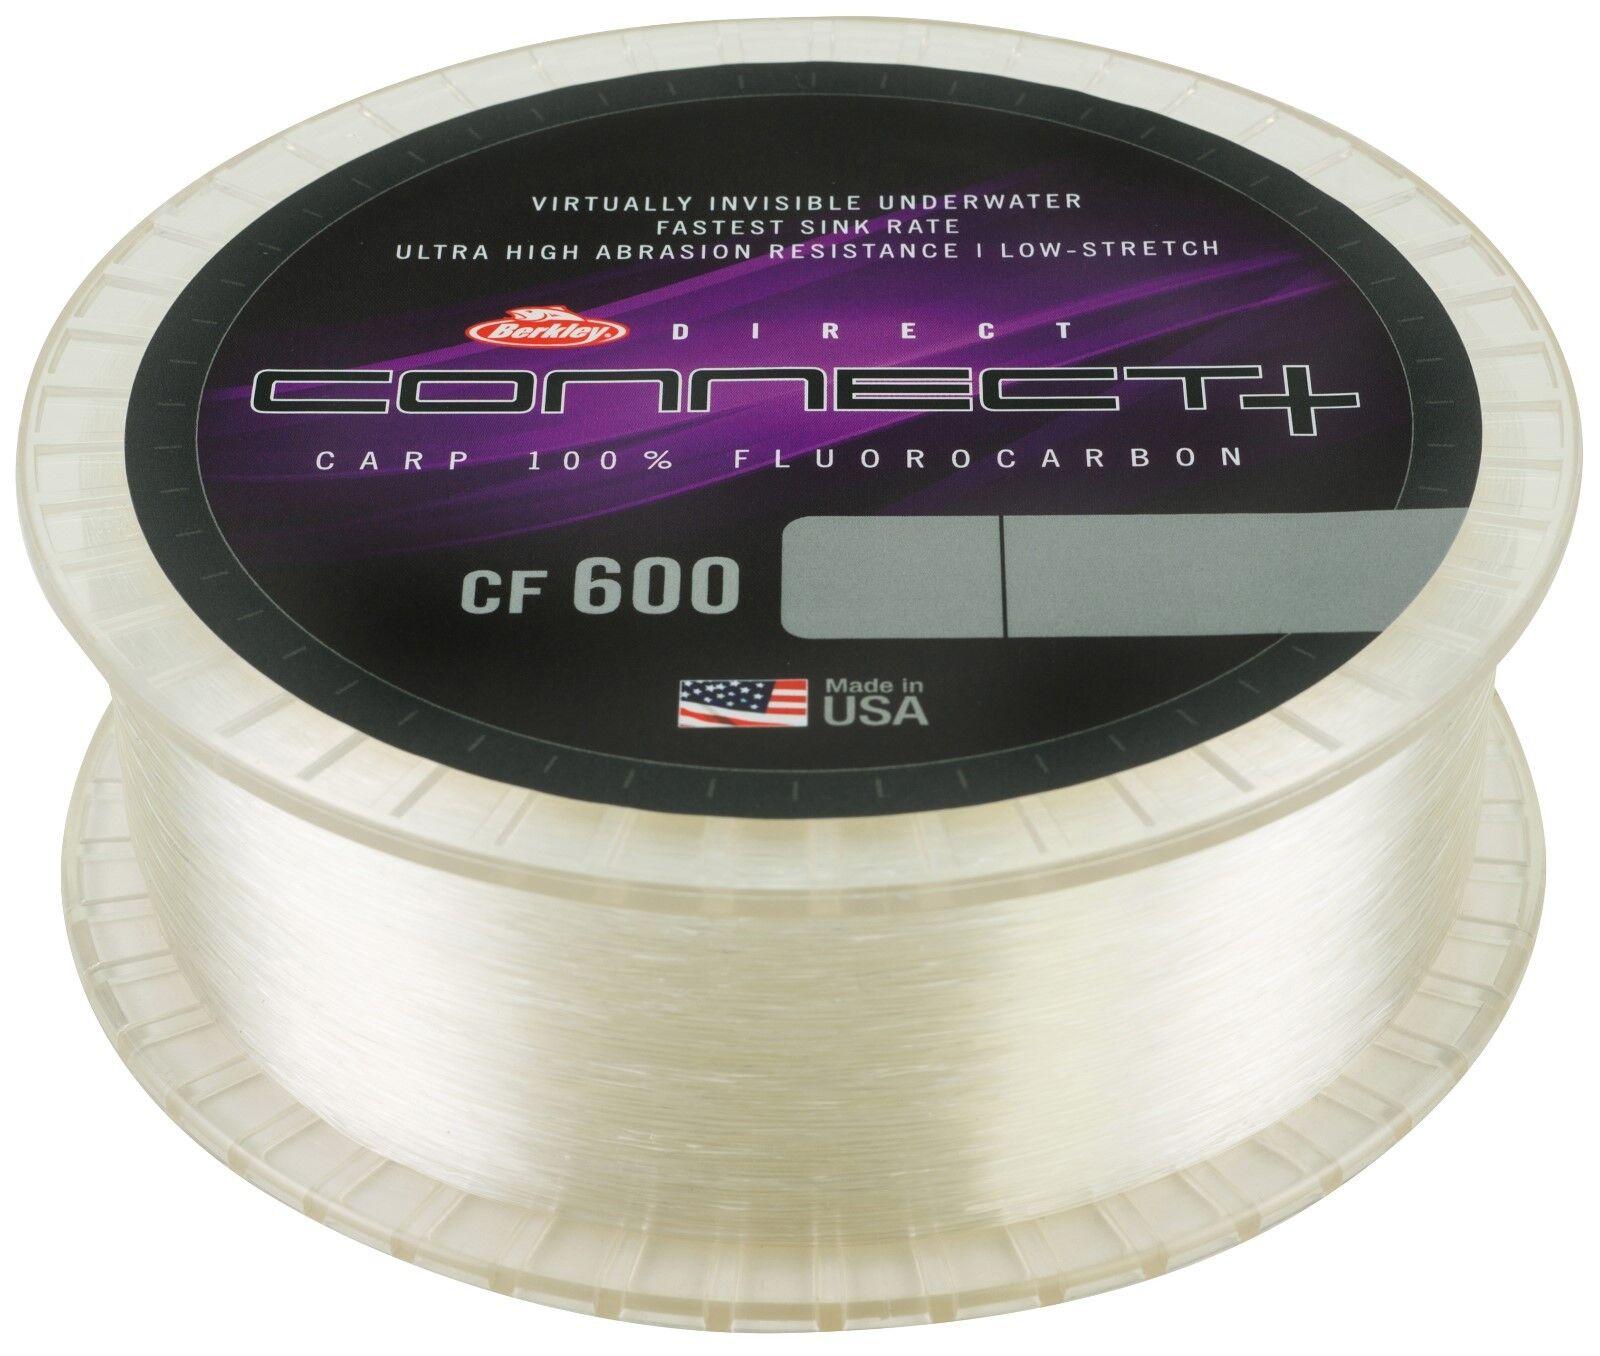 Berkley Connect NEW CF600 100% PVDF Carp Flugoldcarbon 1200m Spool - All B S